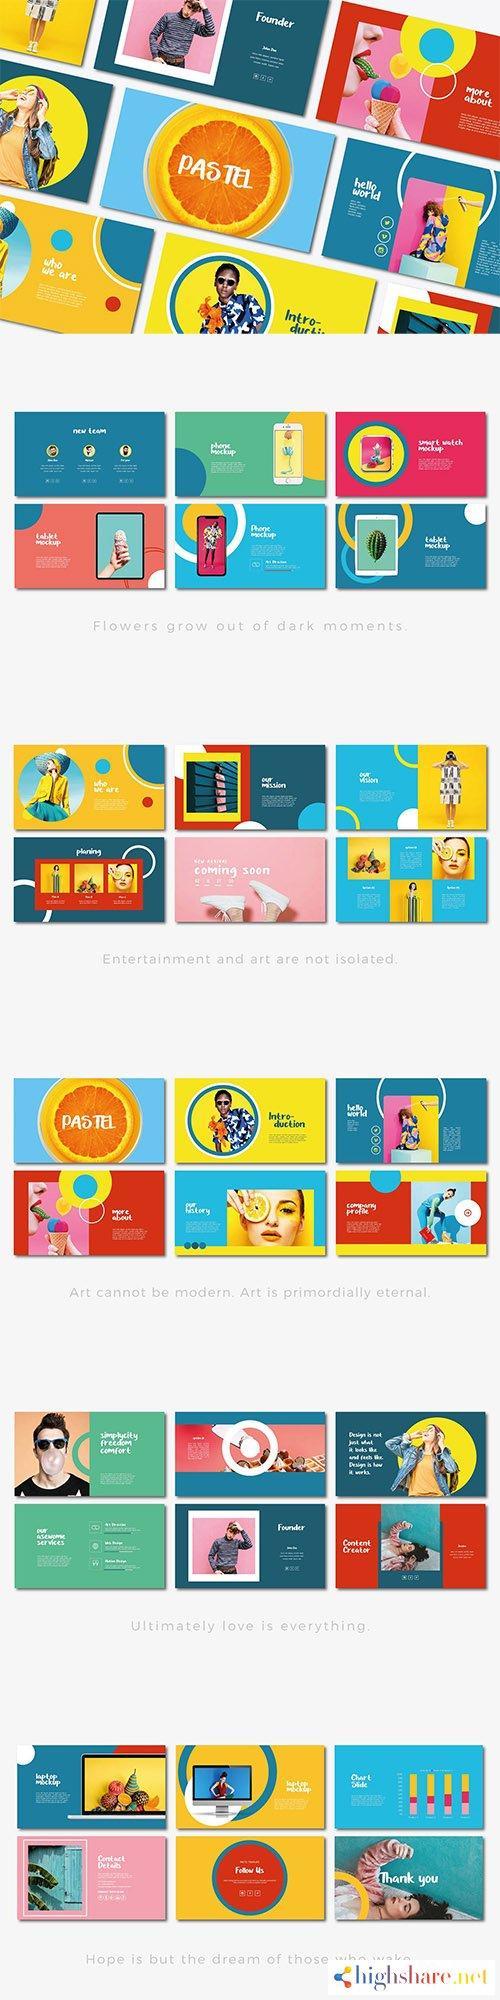 pastel powerpoint keynote and google slides template 5f3b9b9628e25 - Pastel | Powerpoint, Keynote and Google Slides Template